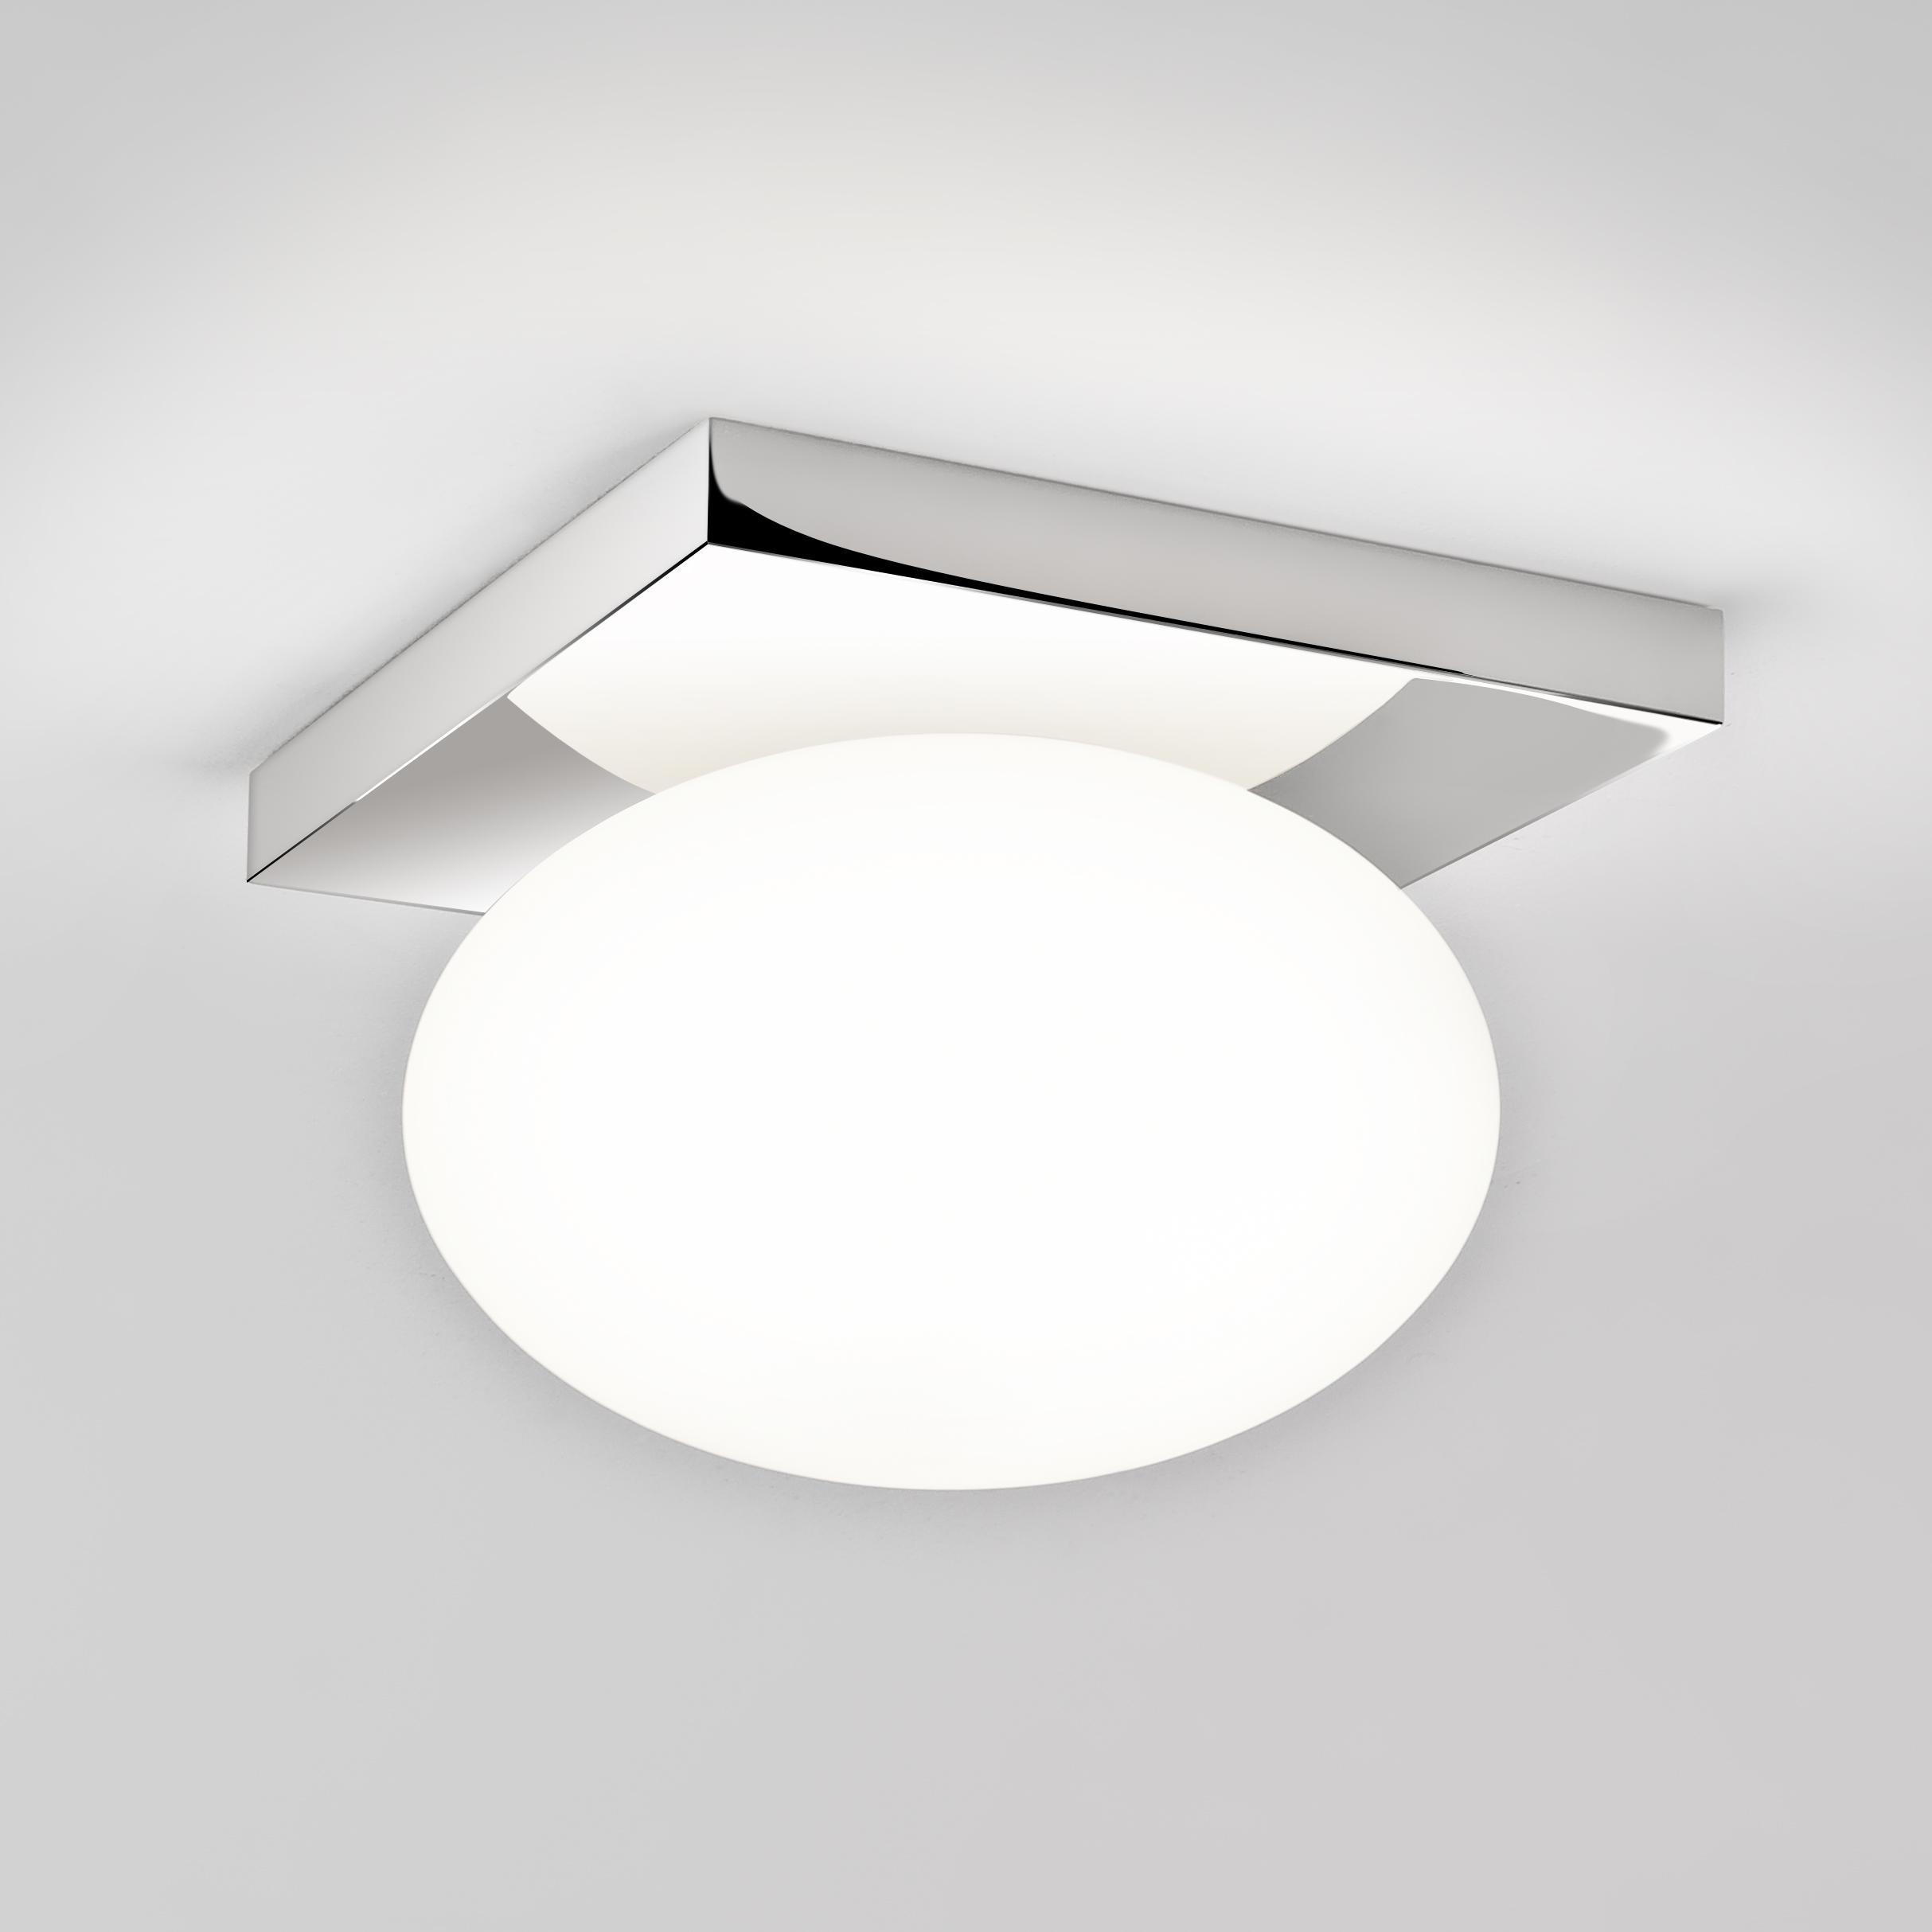 Luminaire salle de bain miroir for Luminaire plafond salle de bain